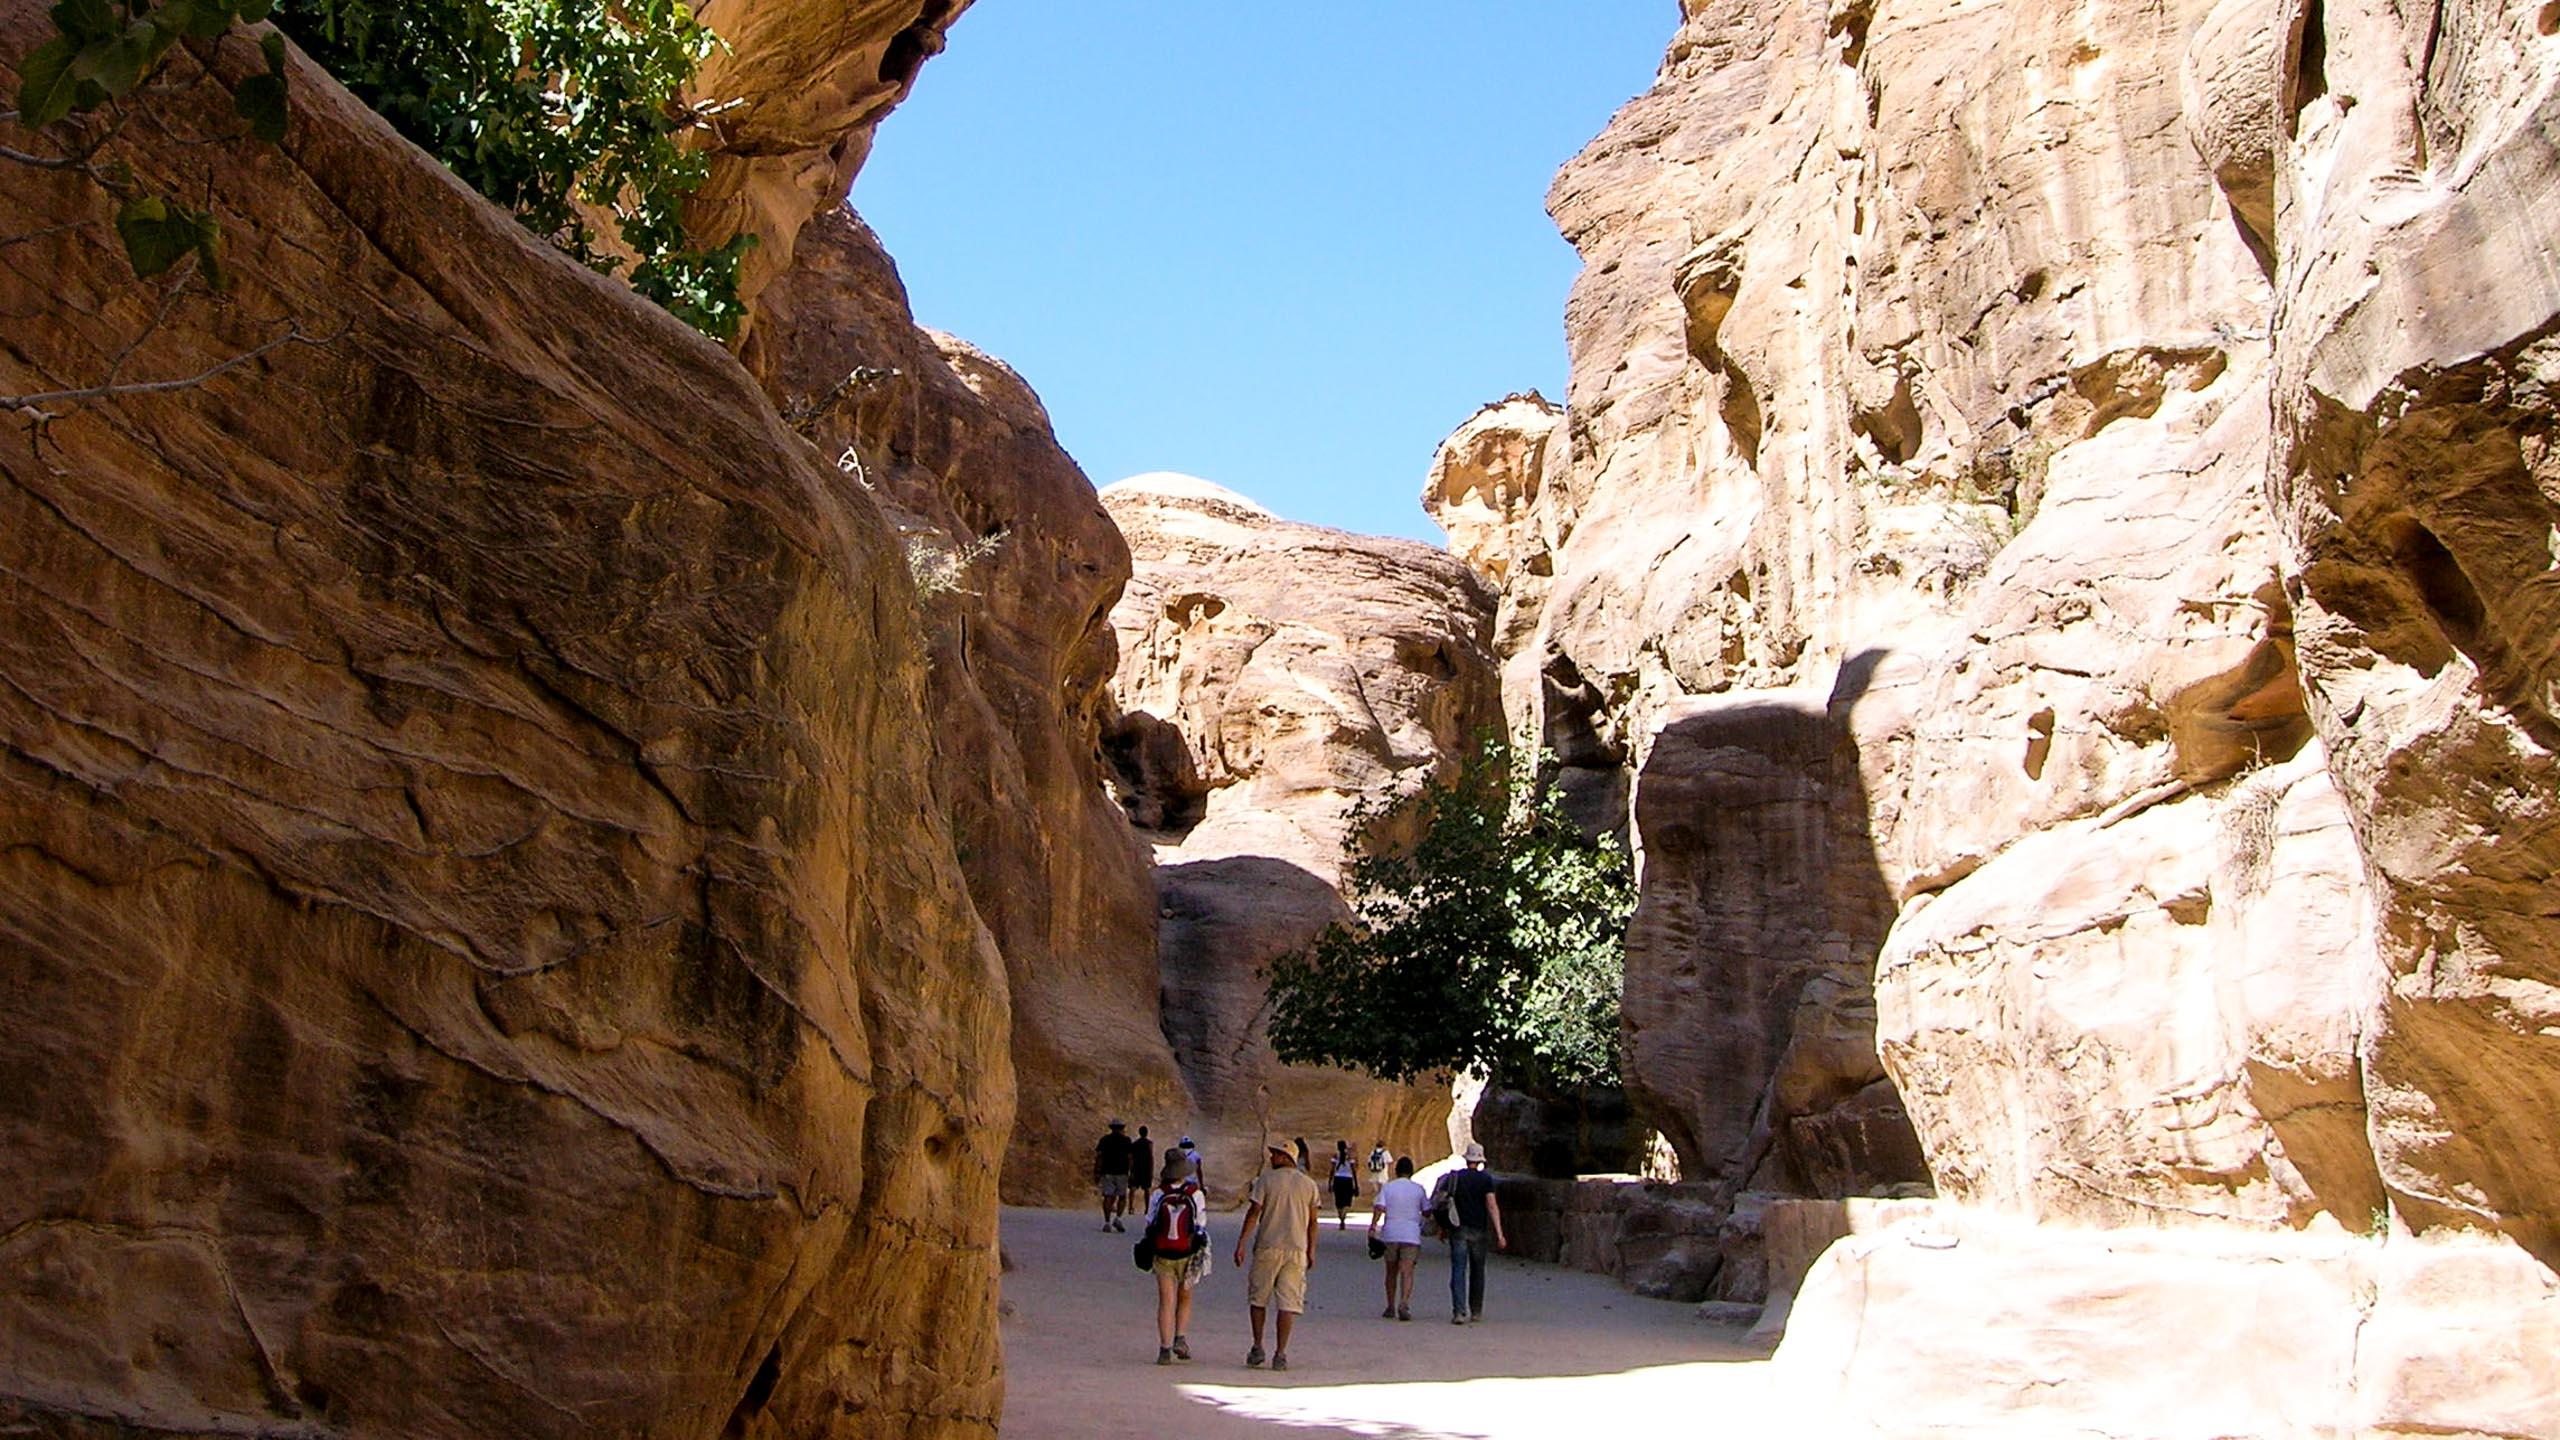 Travelers walk through valley between Jordan cliffs